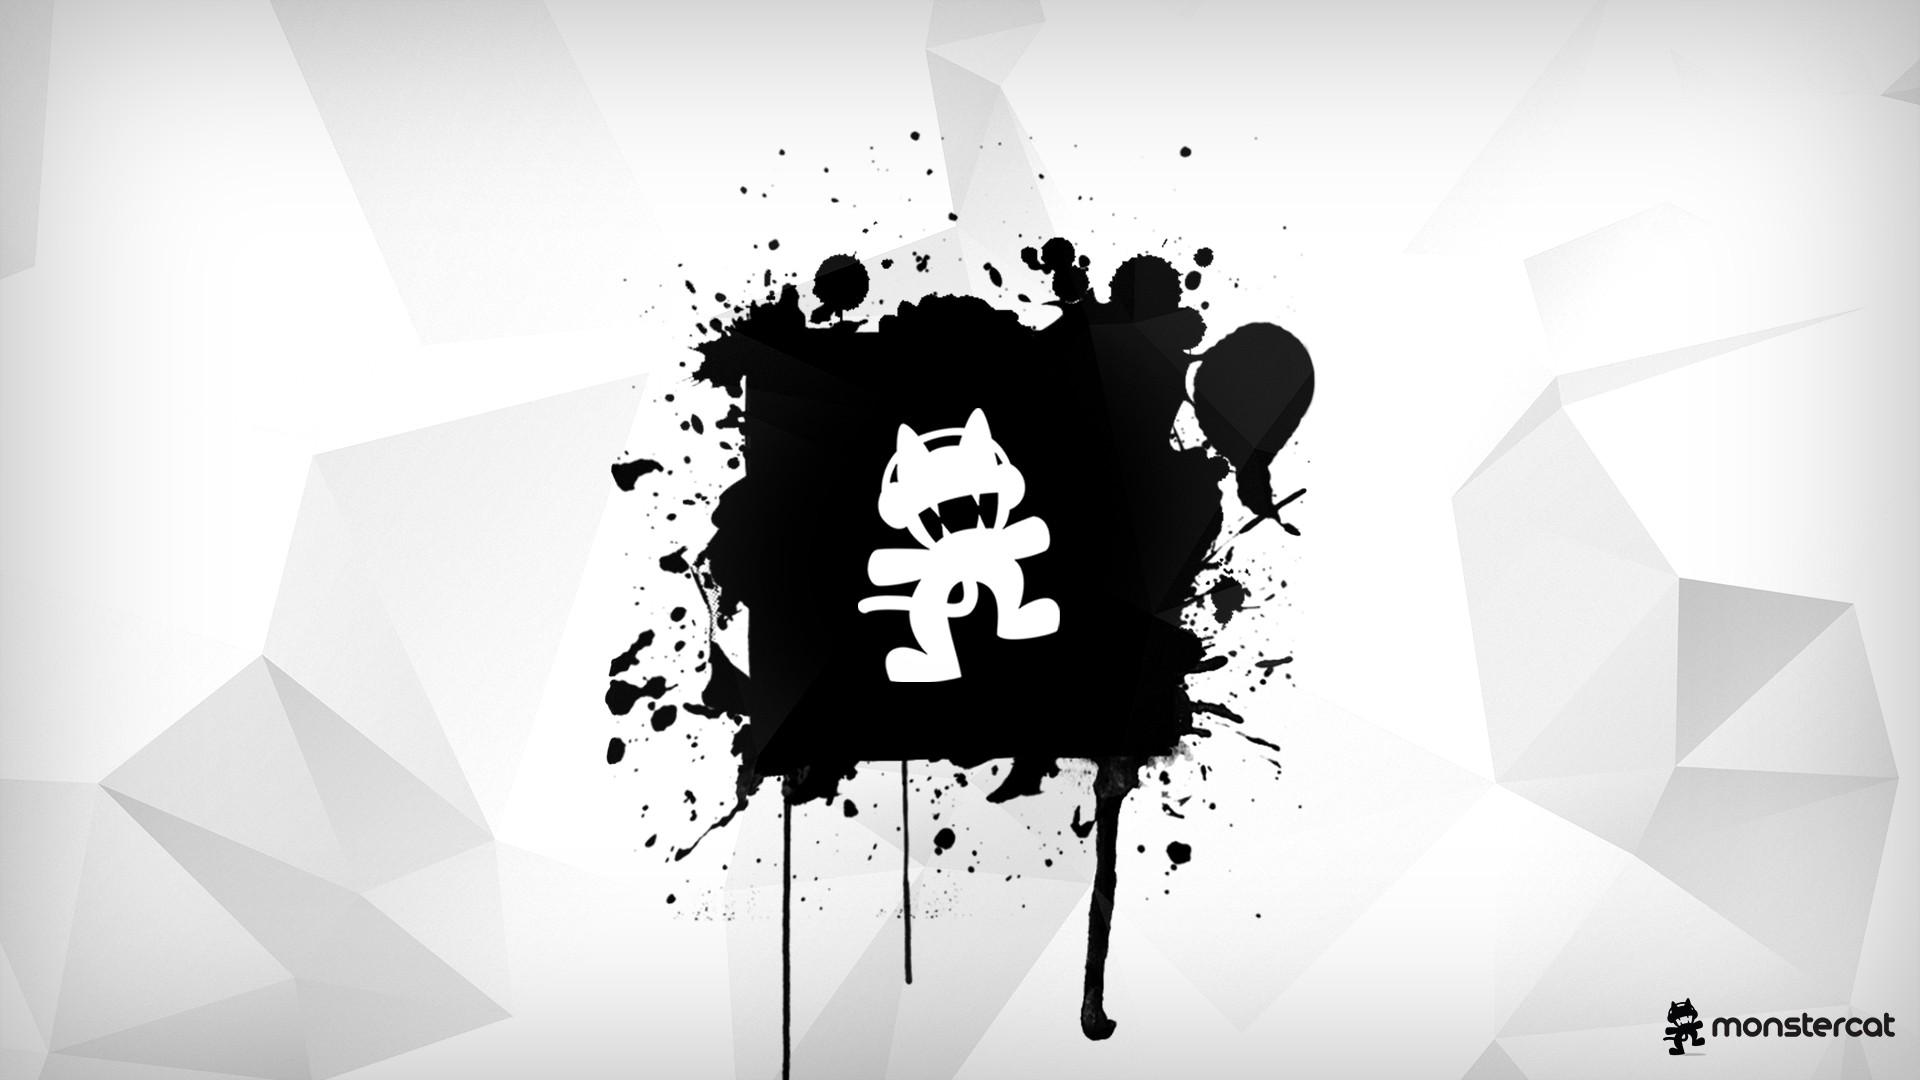 Monstercat hd wallpaper